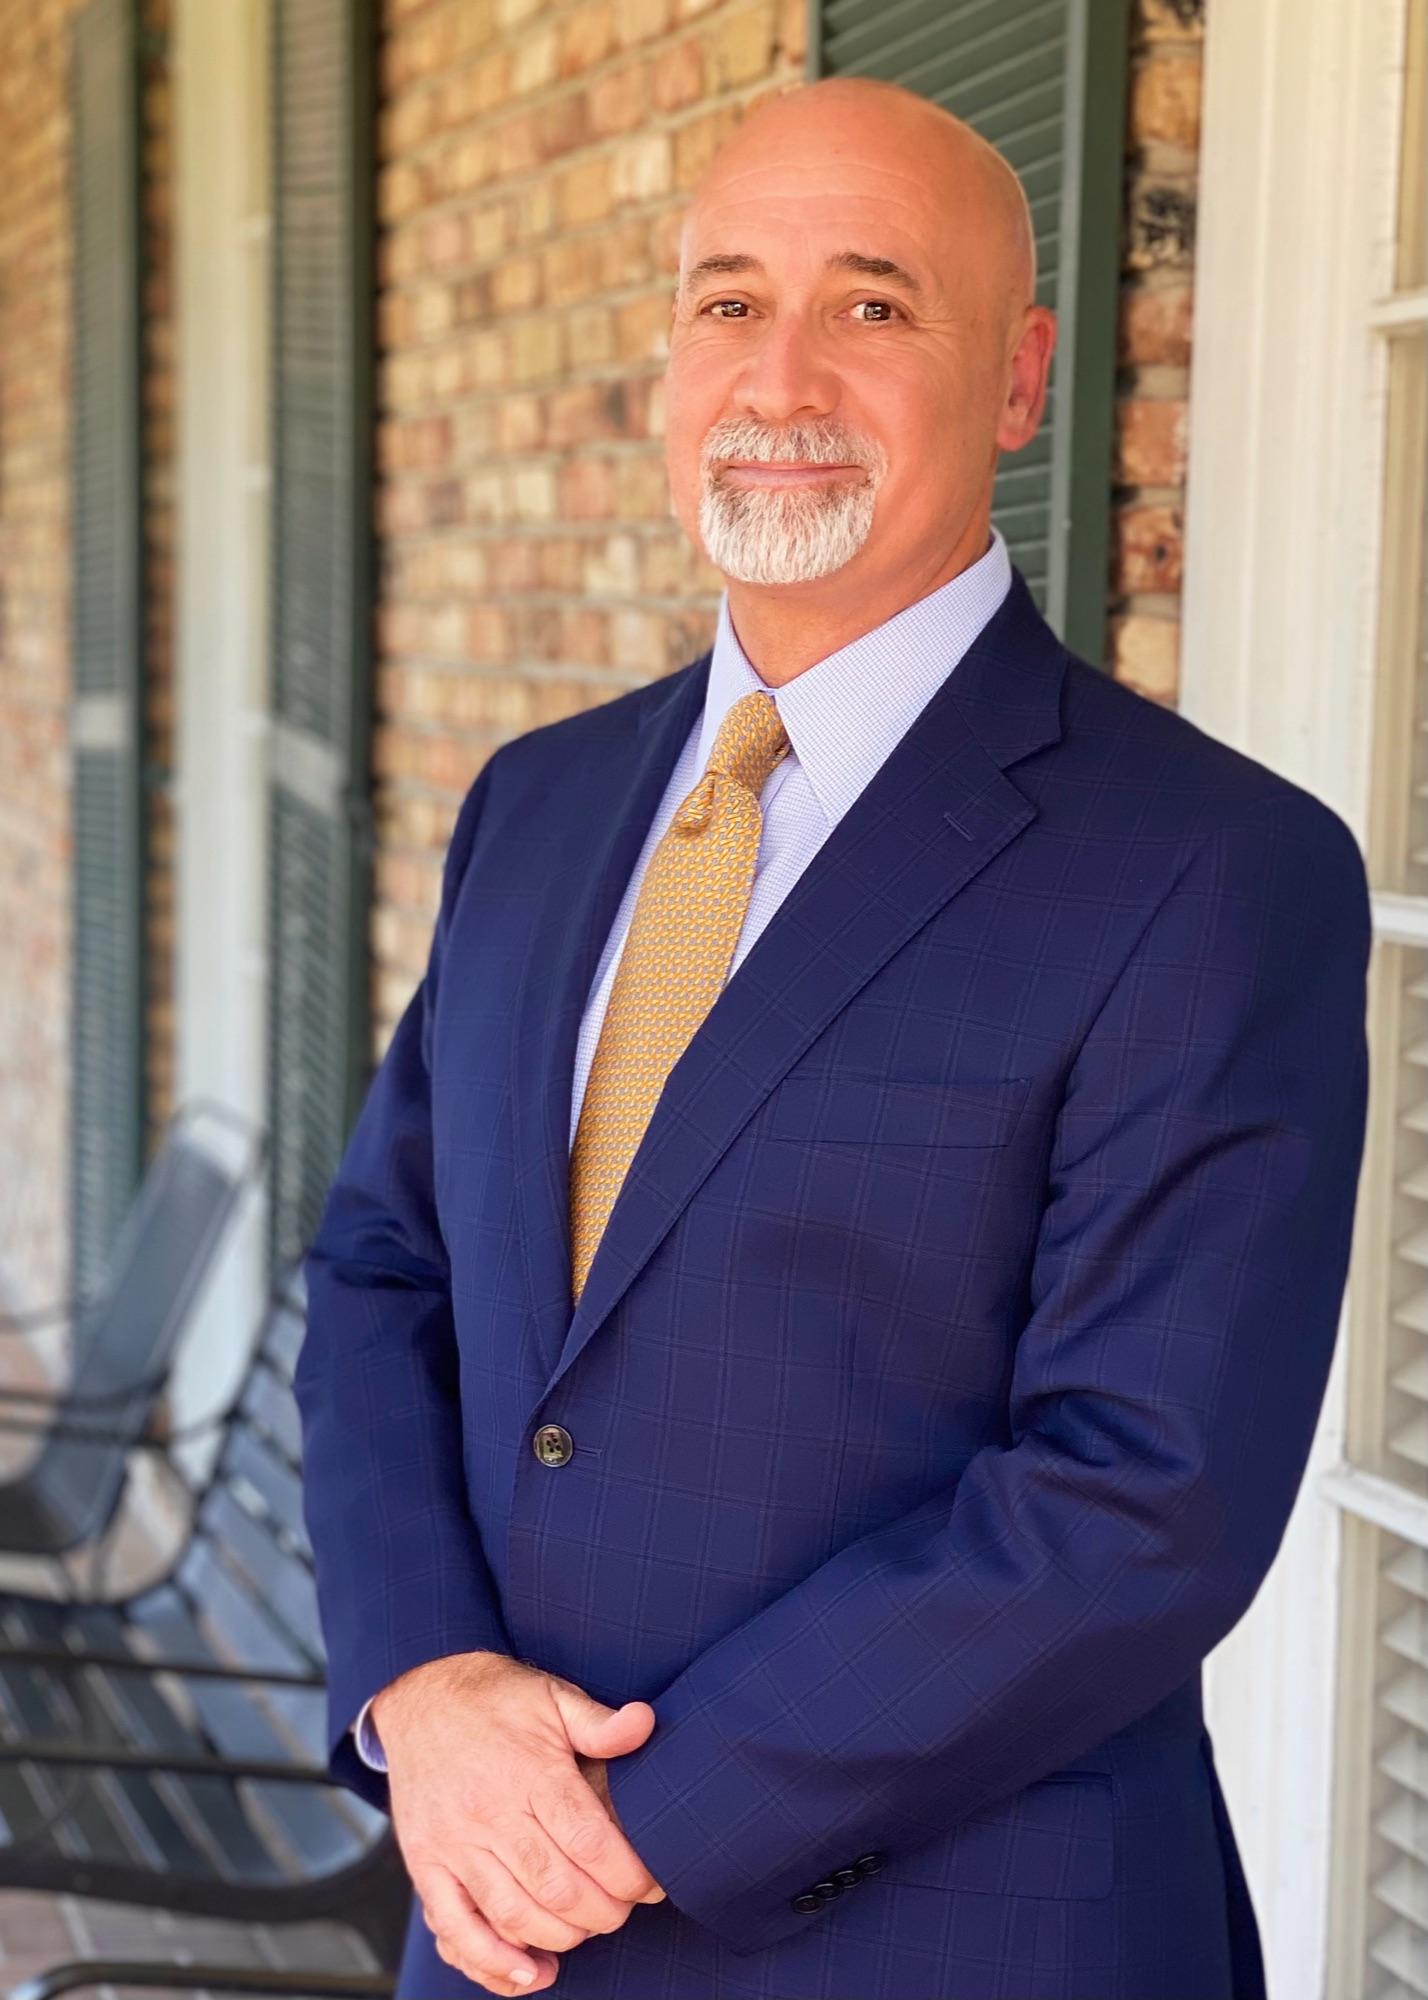 Photo of Gene Pellerin - President - Funeral Director